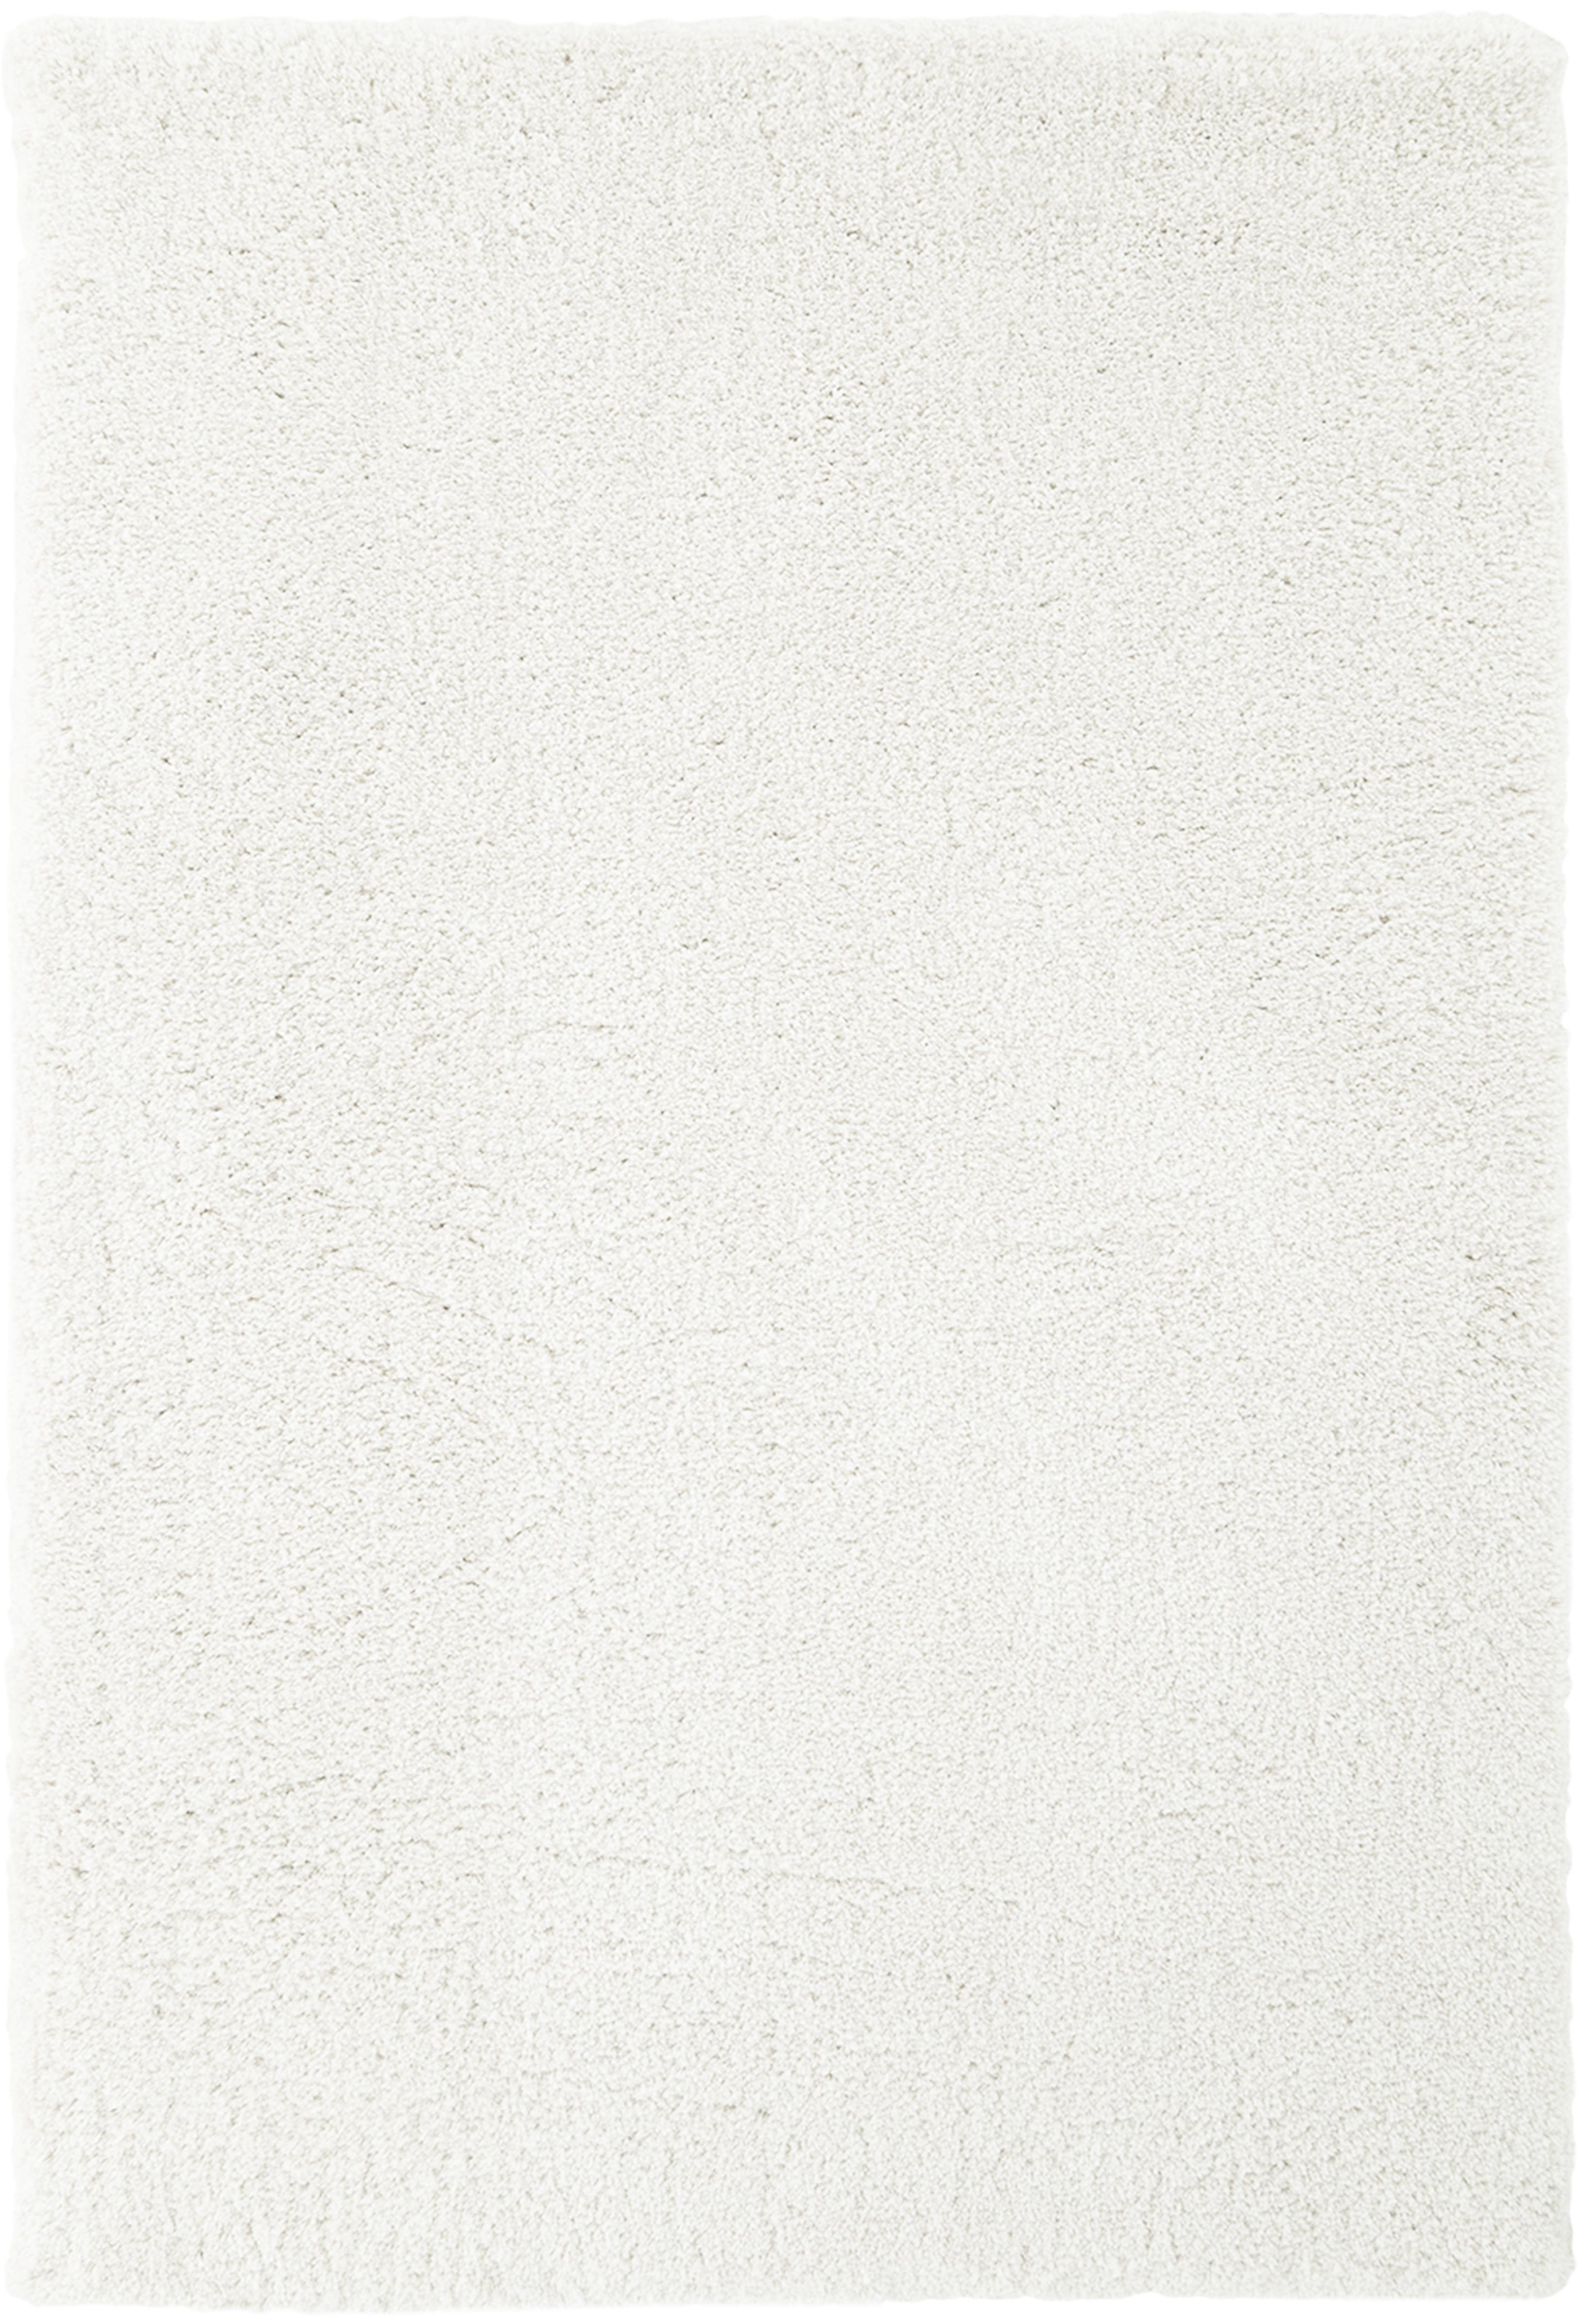 Flauschiger Hochflor-Teppich Leighton in Creme, Flor: 100% Polyester (Mikrofase, Creme, B 200 x L 300 cm (Grösse L)